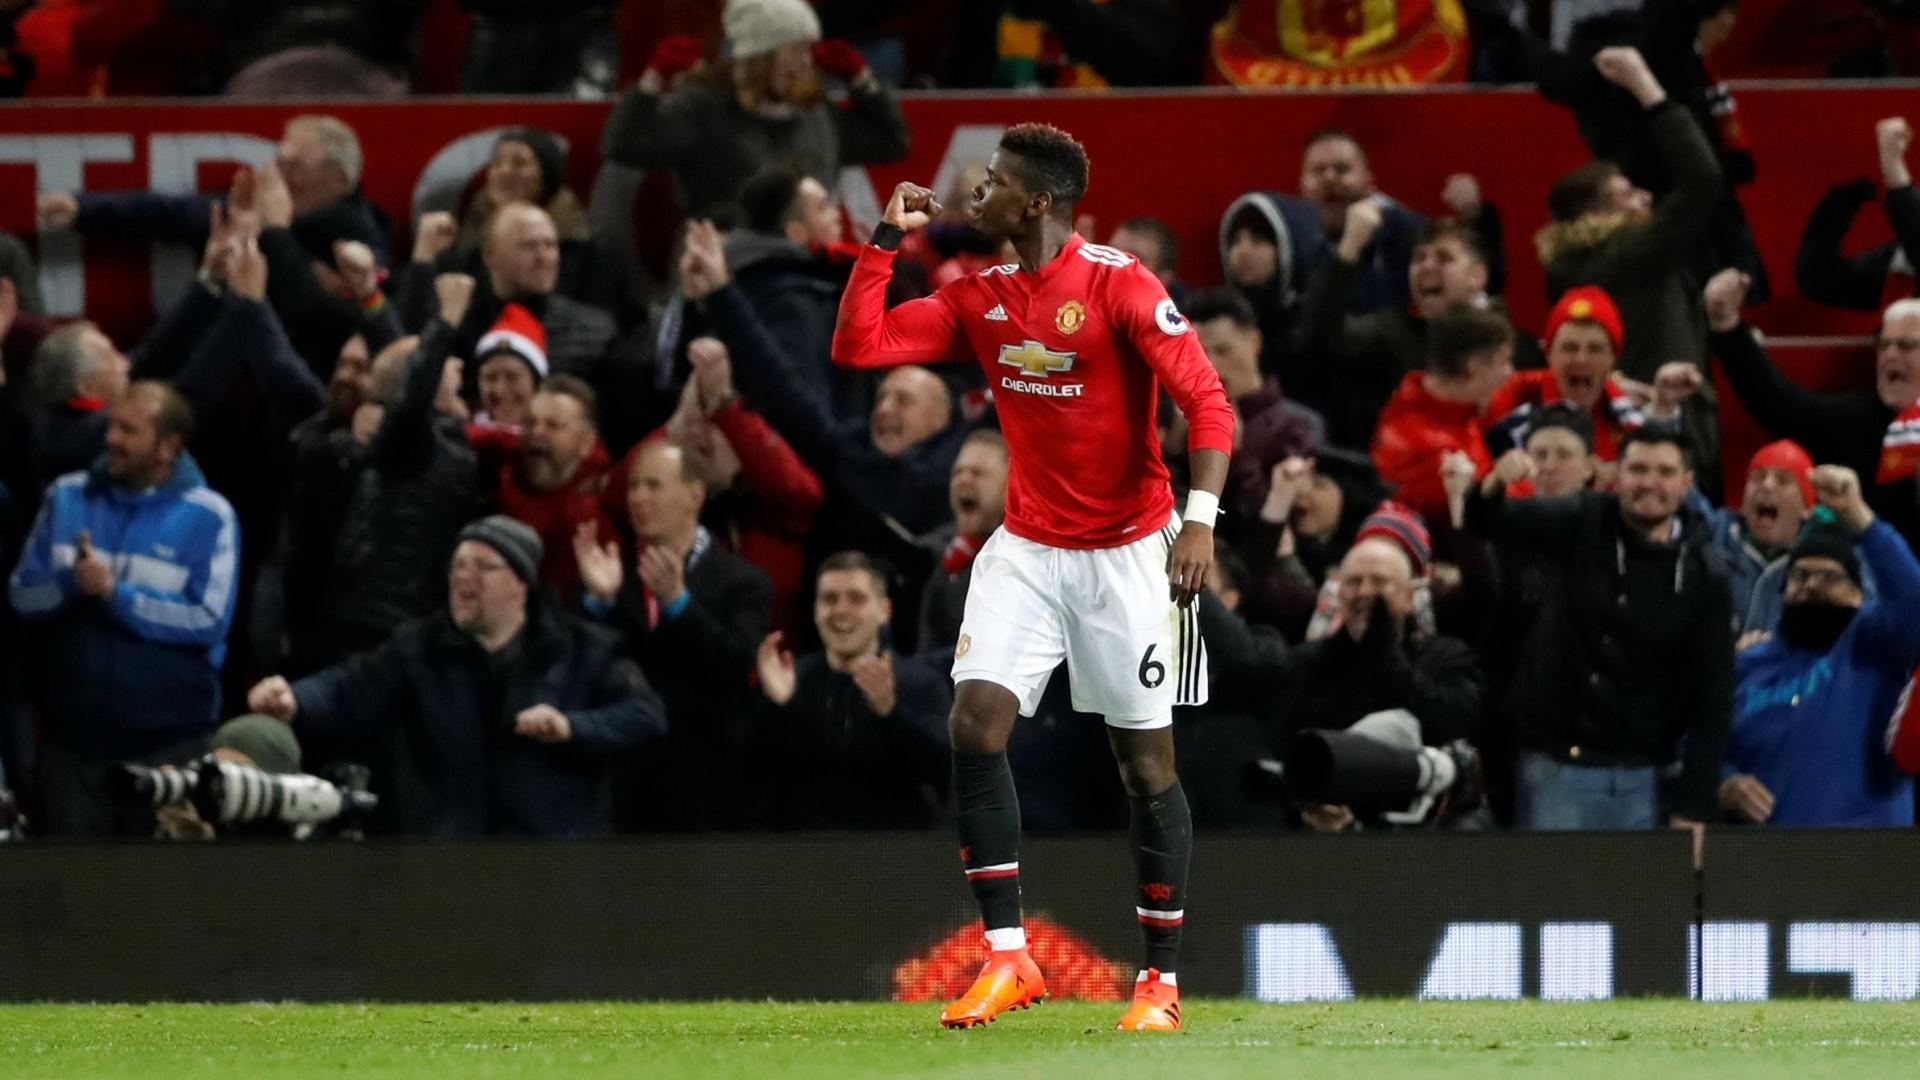 Pogba comemora gol marcado pelo Manchester United contra o Newcastle